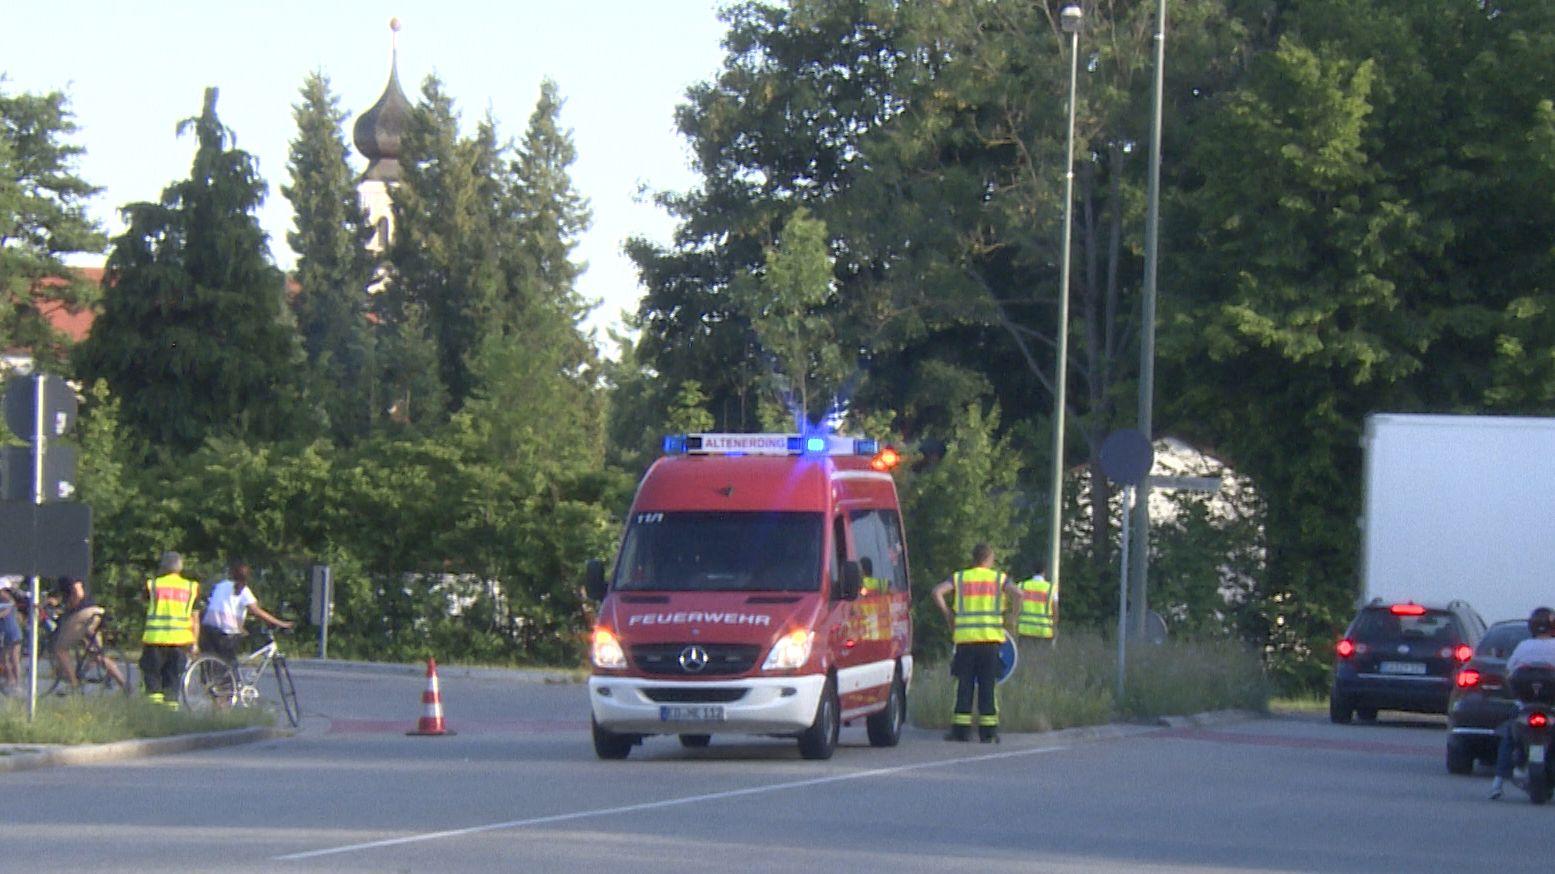 Straßensperre der Feuerwehr wegen Bombenentschärfung in Erding